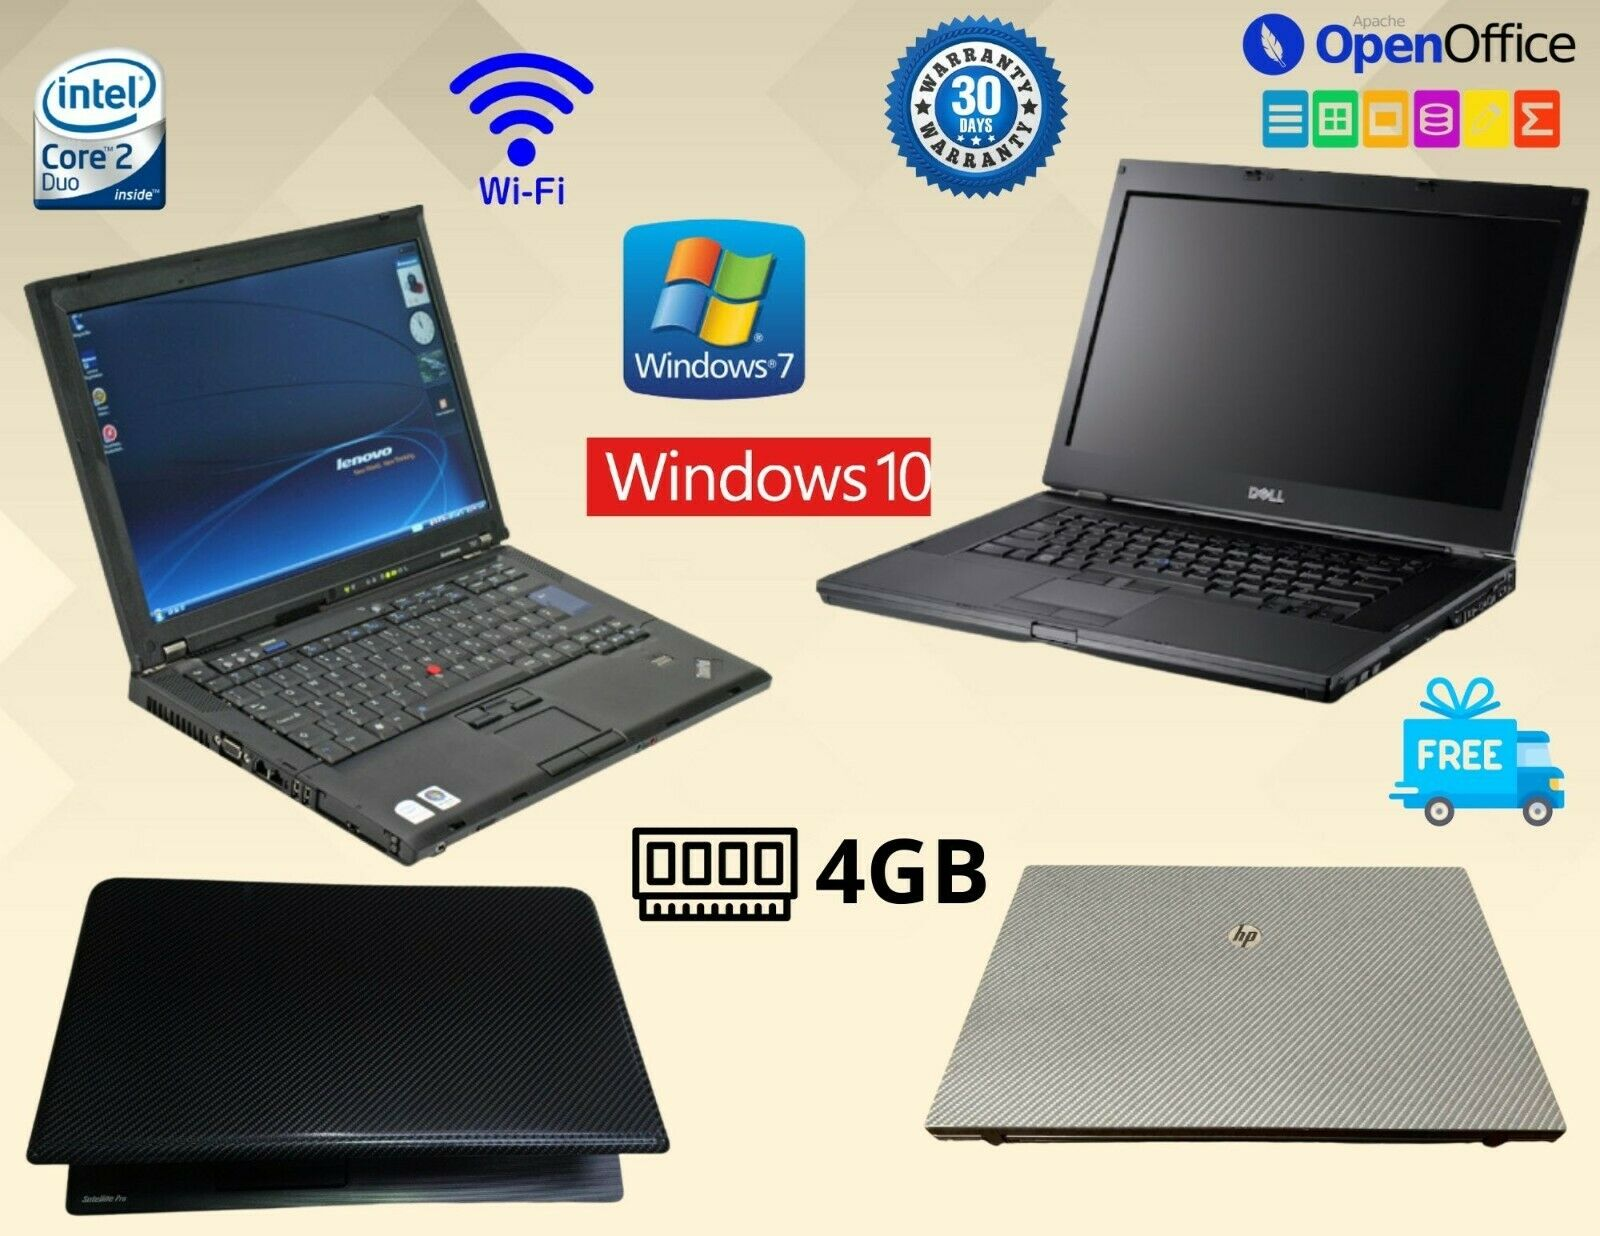 Laptop Windows - FAST CHEAP LAPTOP HP LENOVO DELL TOSHIBA INTEL CORE 2 DUO 4GB RAM WINDOWS 7 / 10